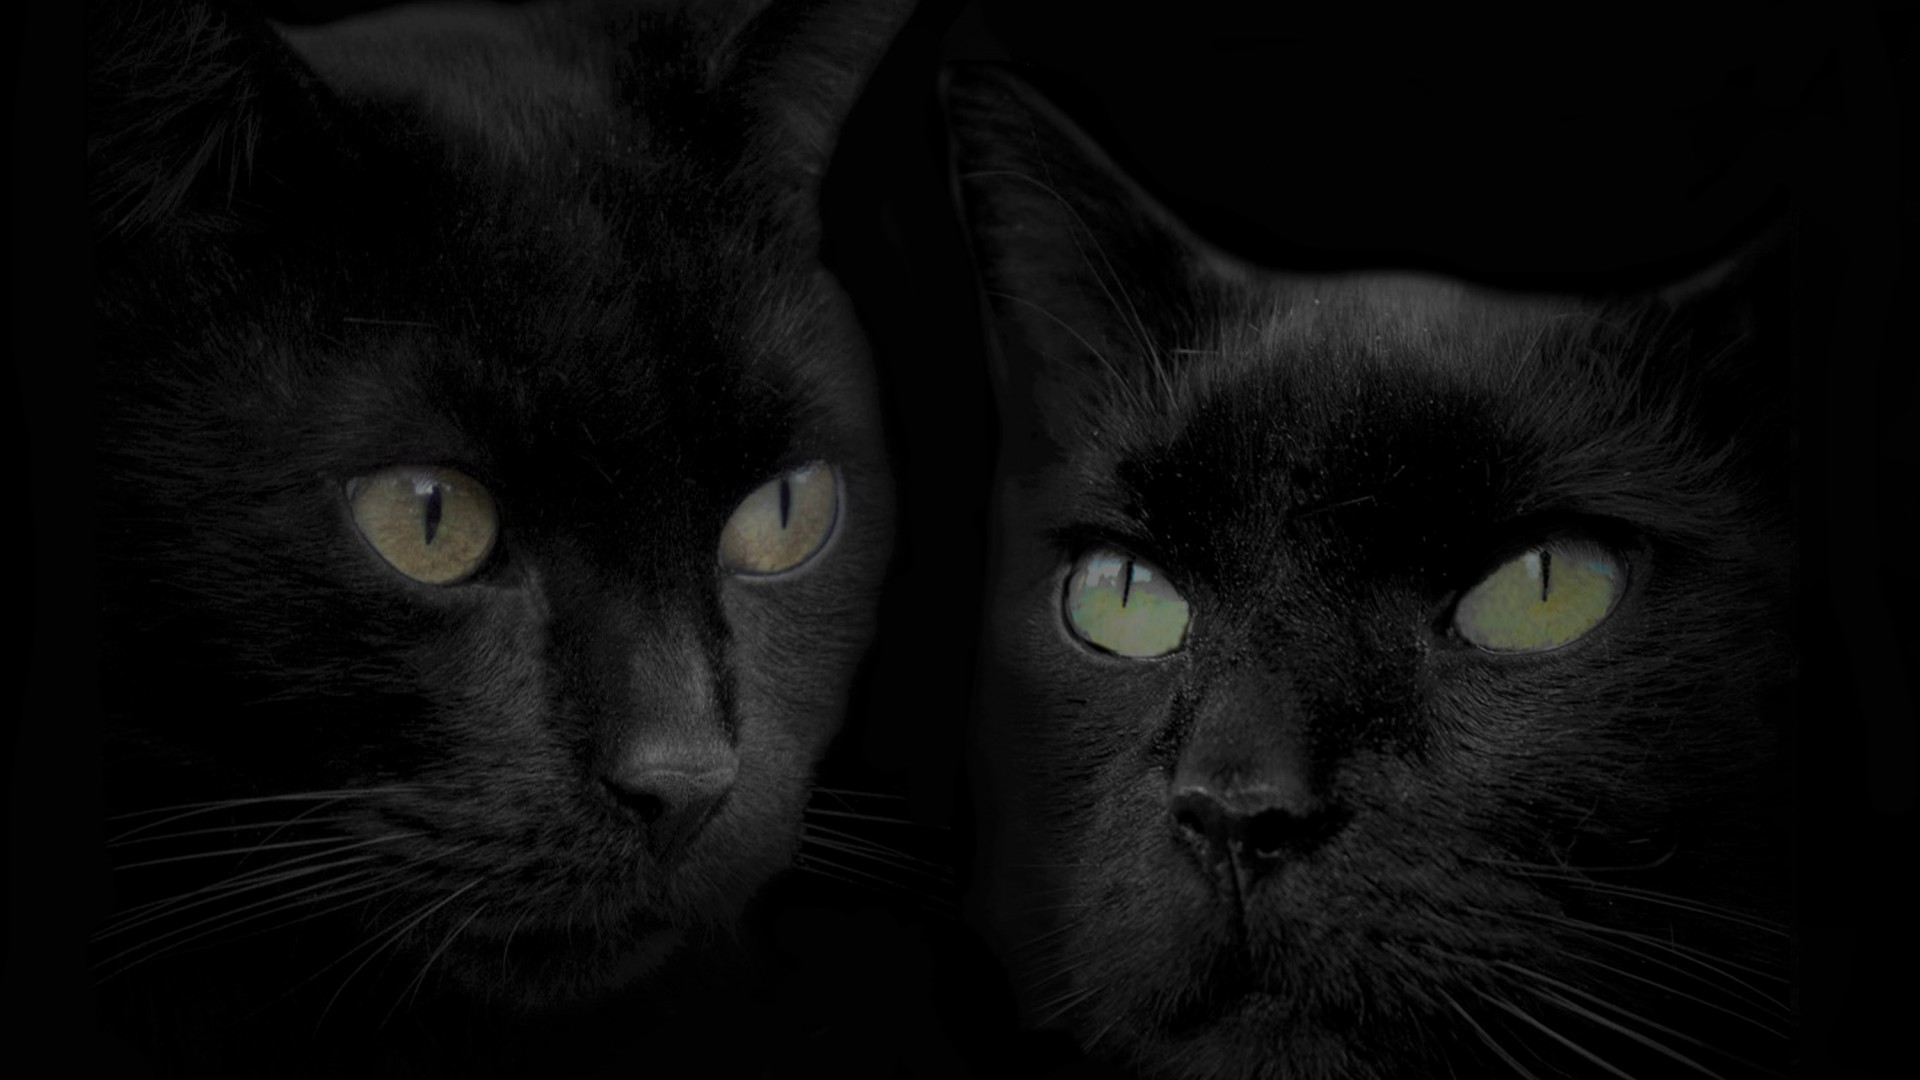 Black Cat Hd Wallpapers Posted By John Peltier